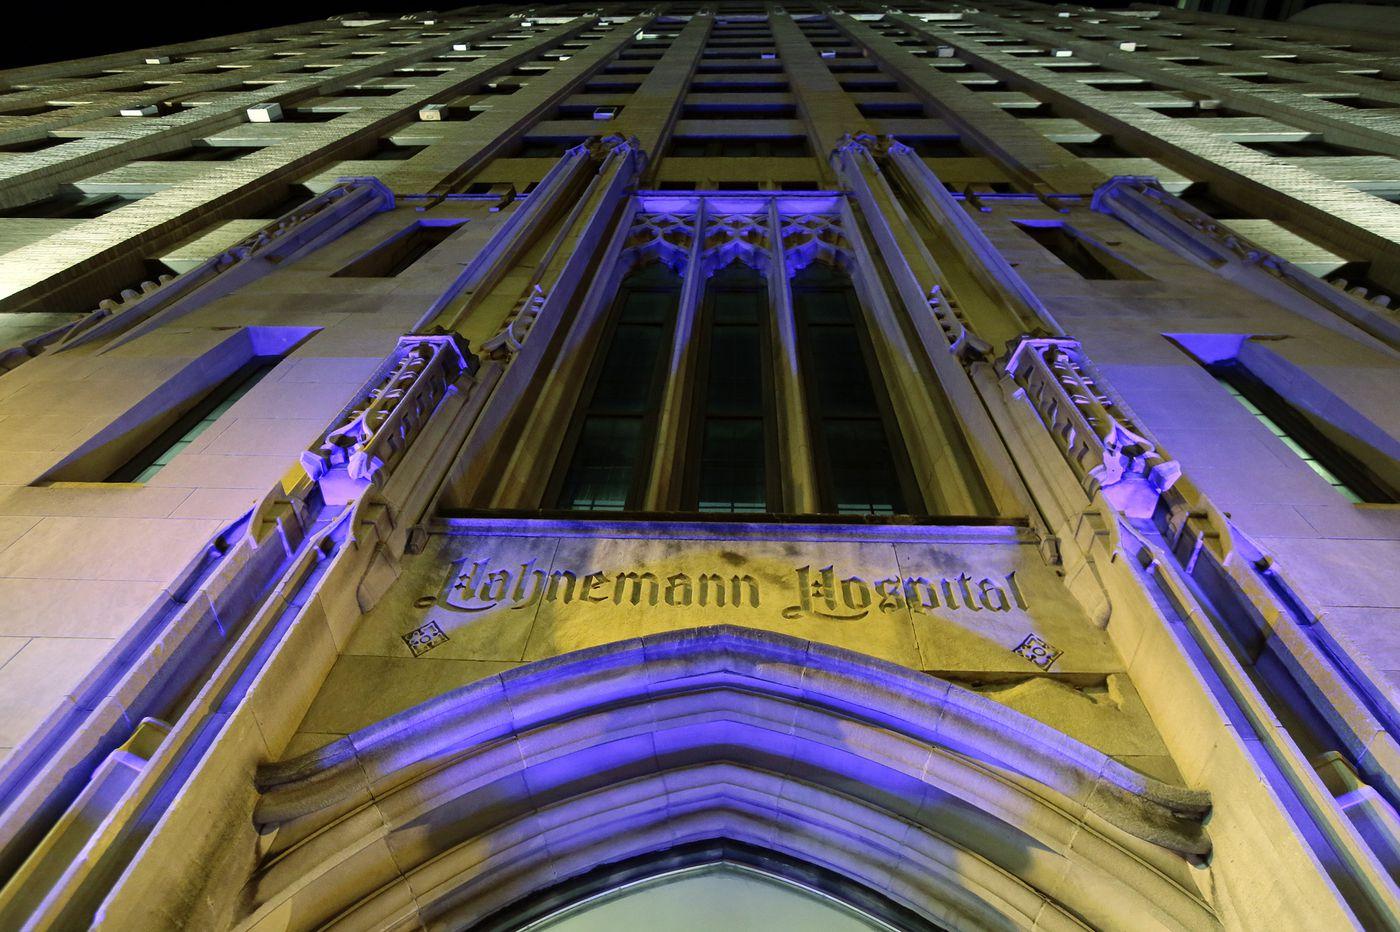 Hahnemann University Hospital: 171 years of Philadelphia medical history